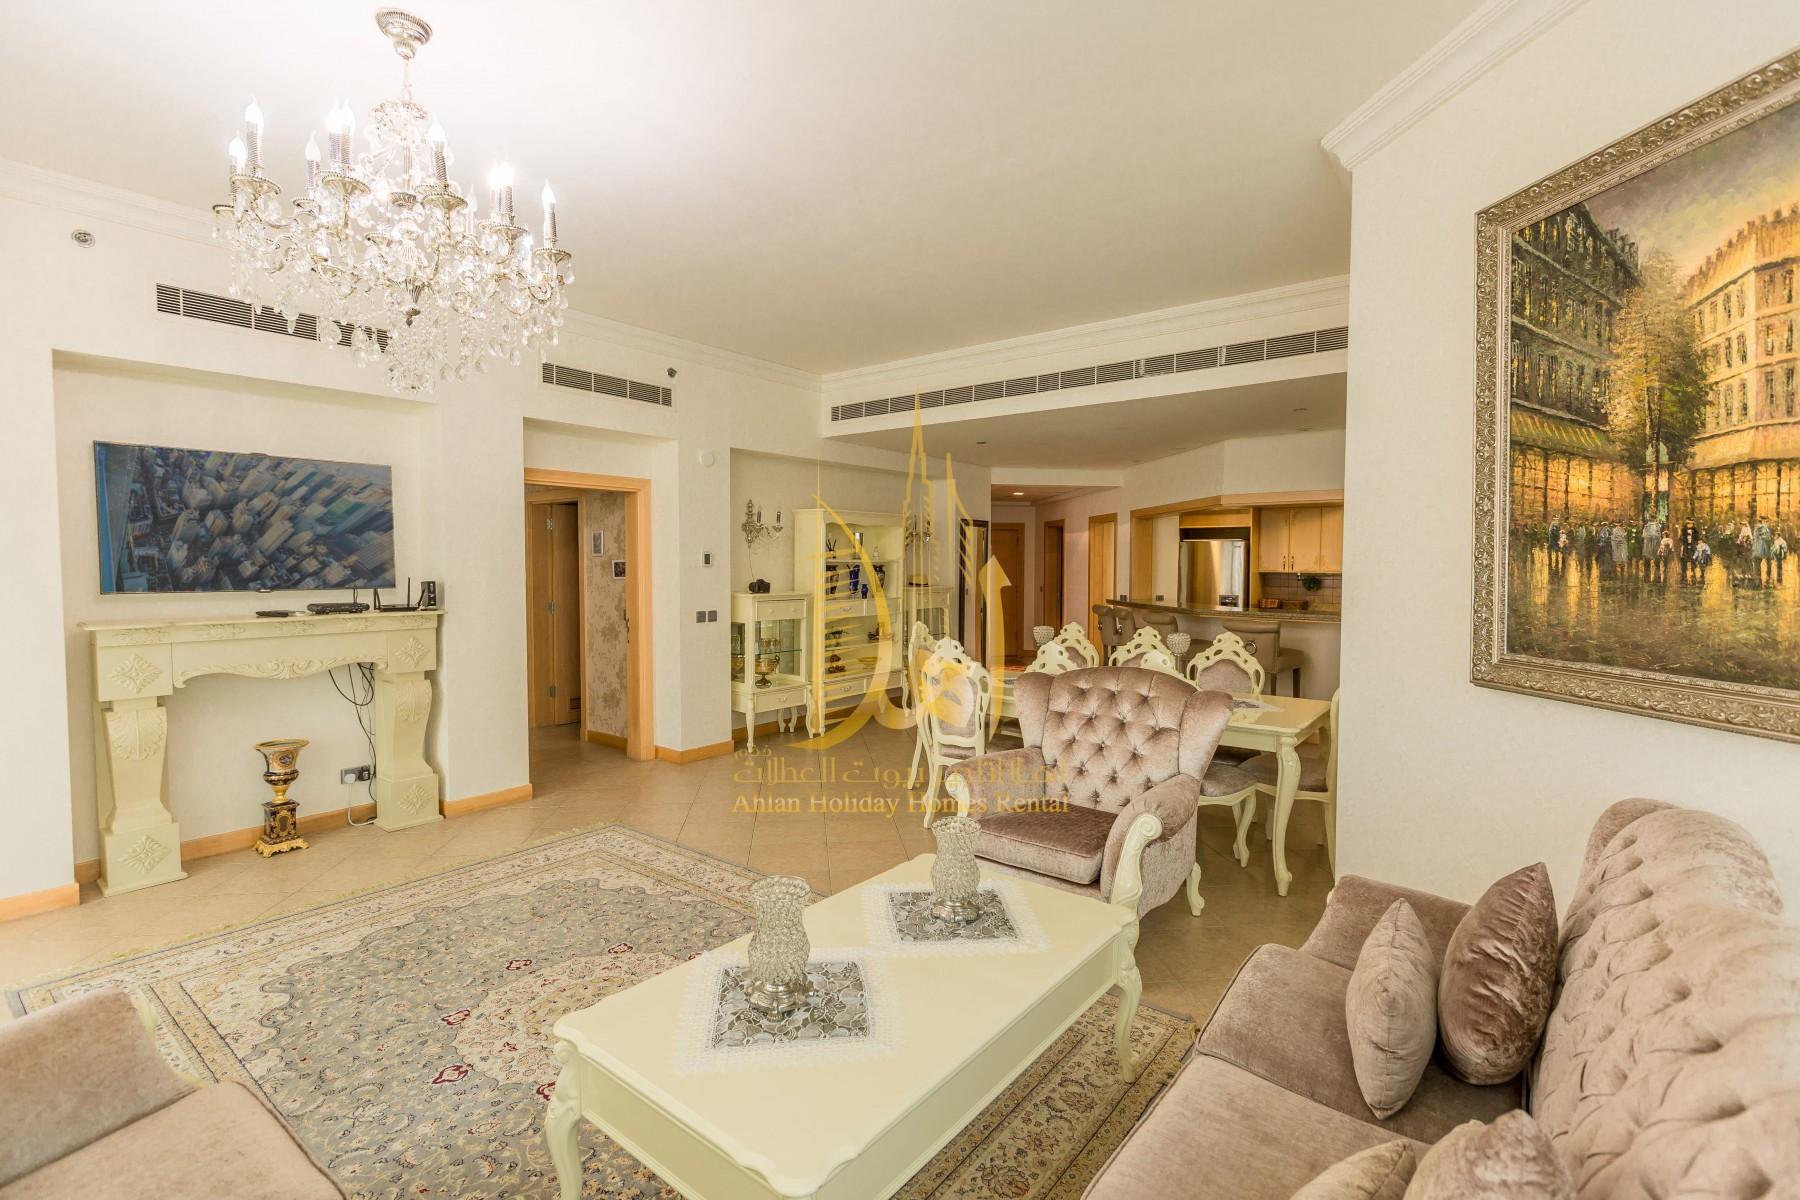 Apartment In Dubai   Royal Furnished 3BR Al Basri Shoreline 1 Palm ...